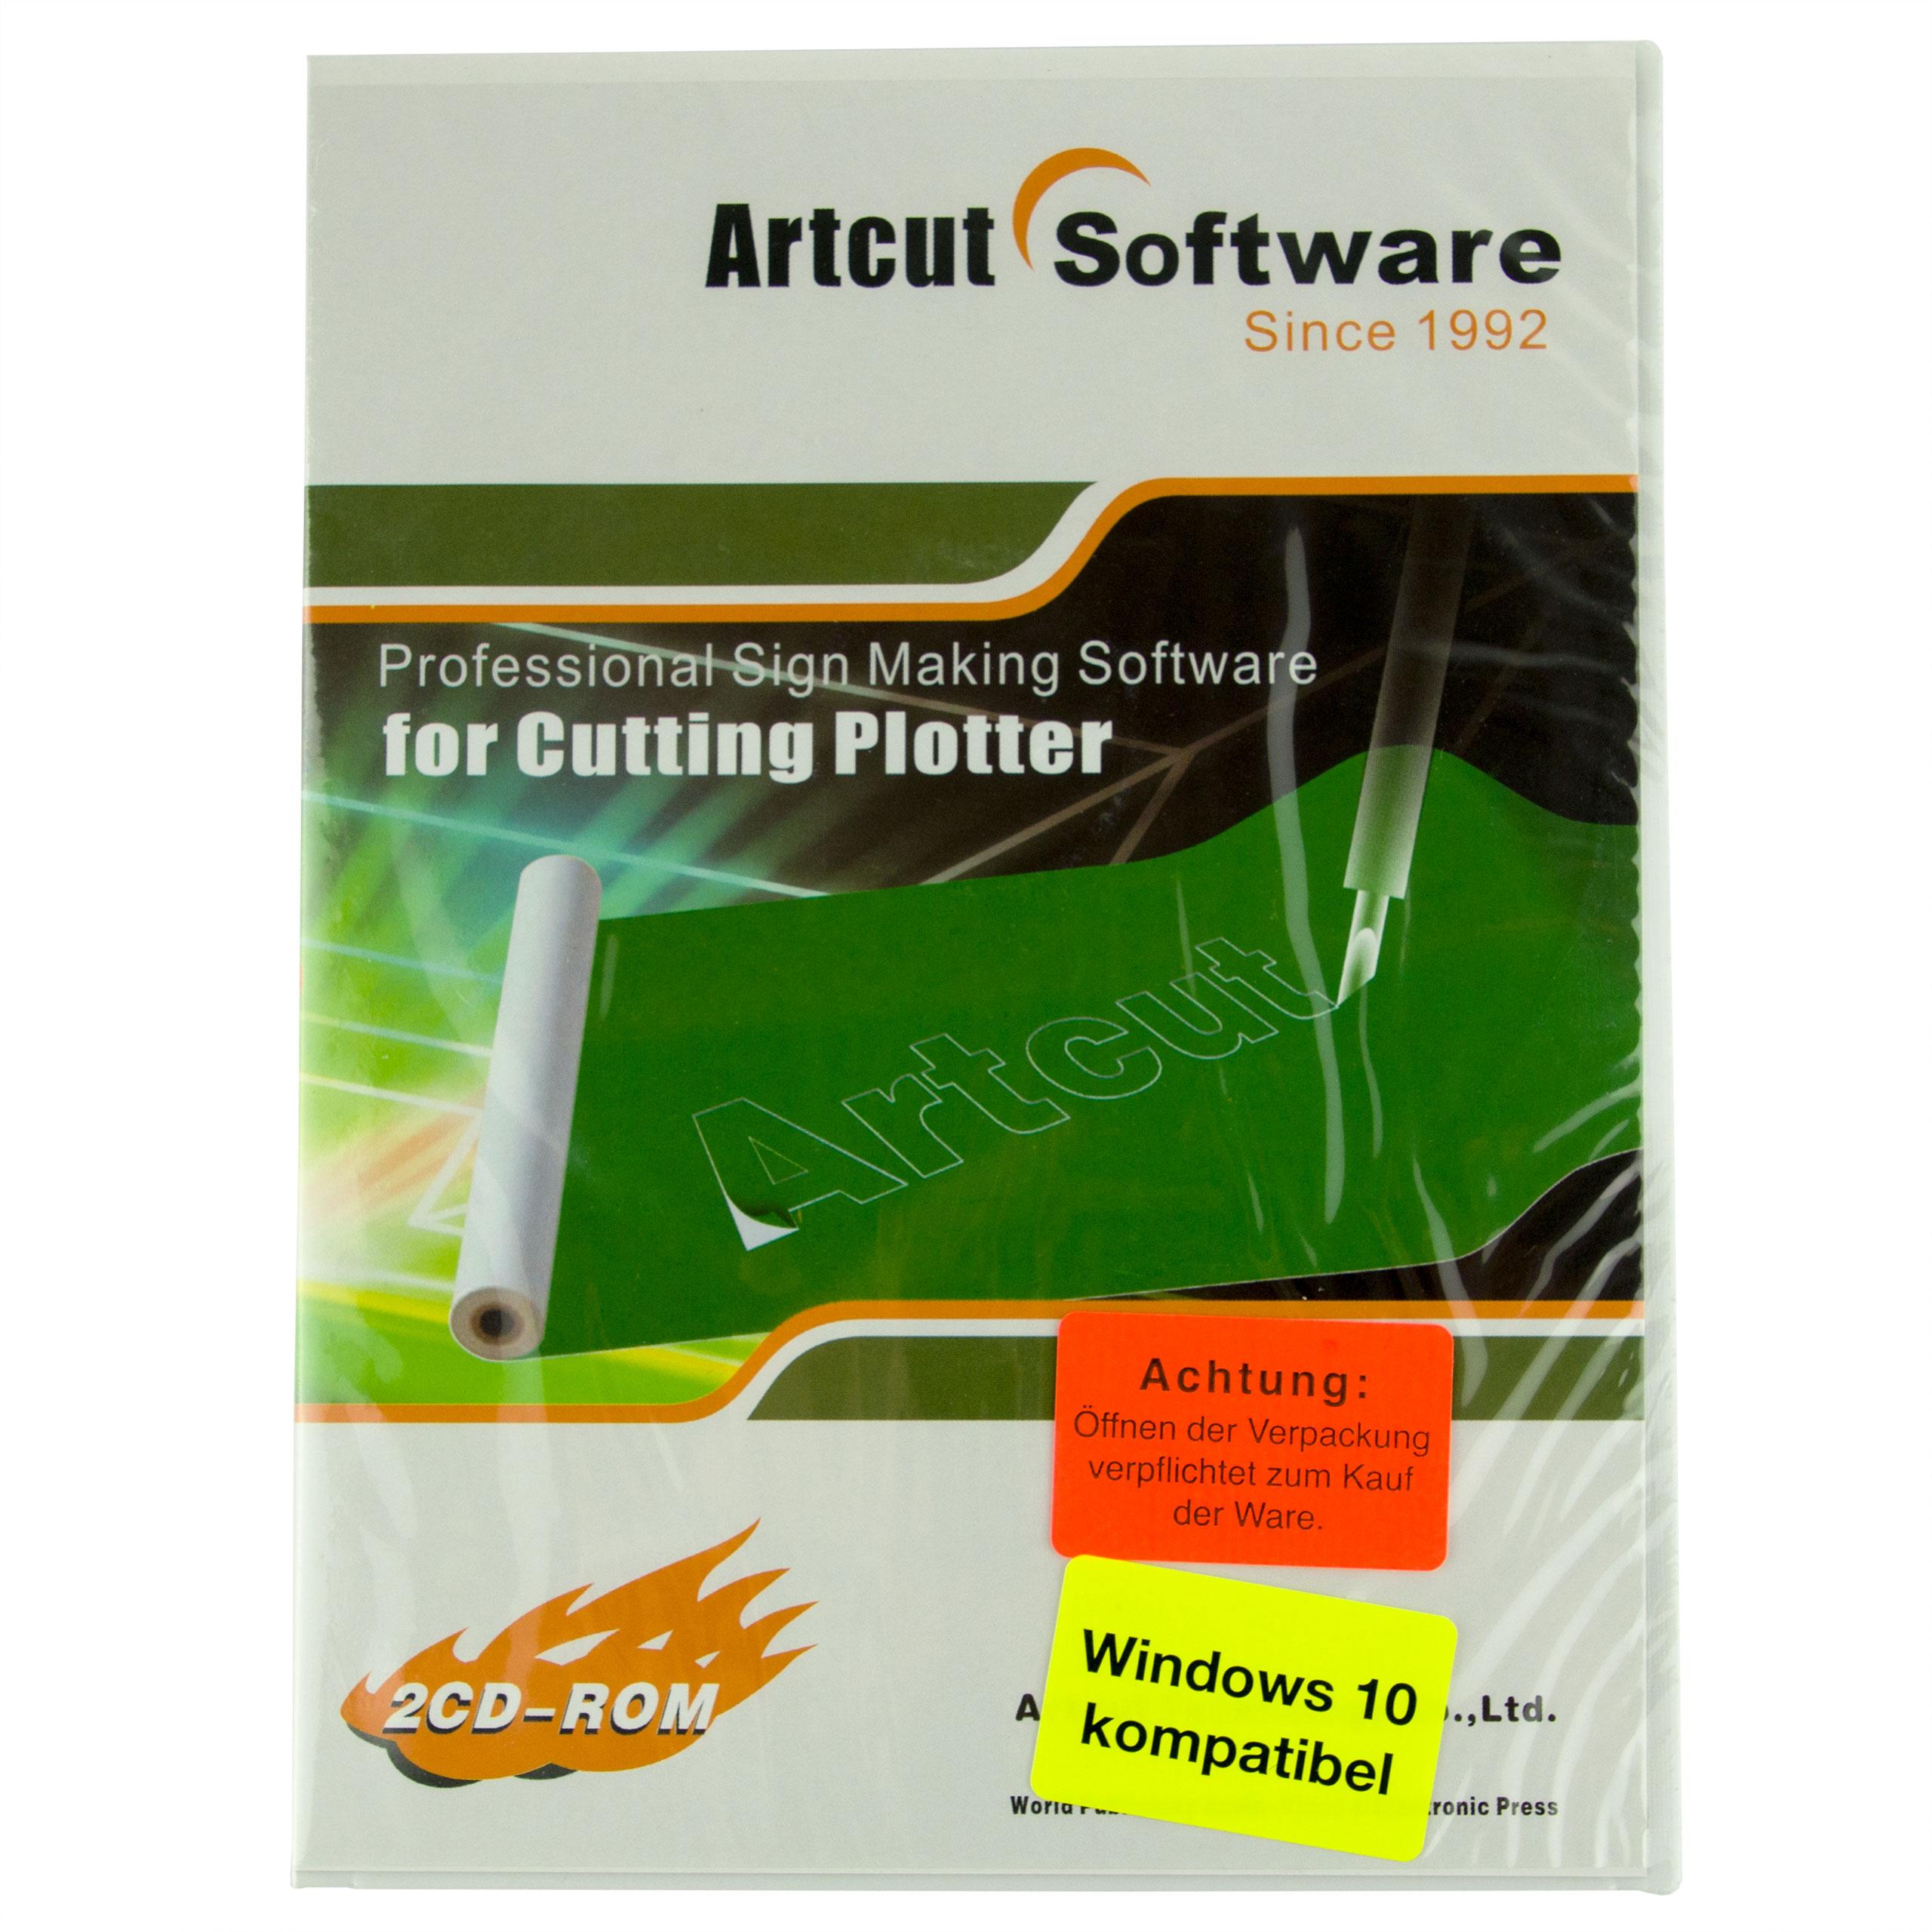 Artcut Professional Sign Making Software für Cutting Plotter Schneideplotter